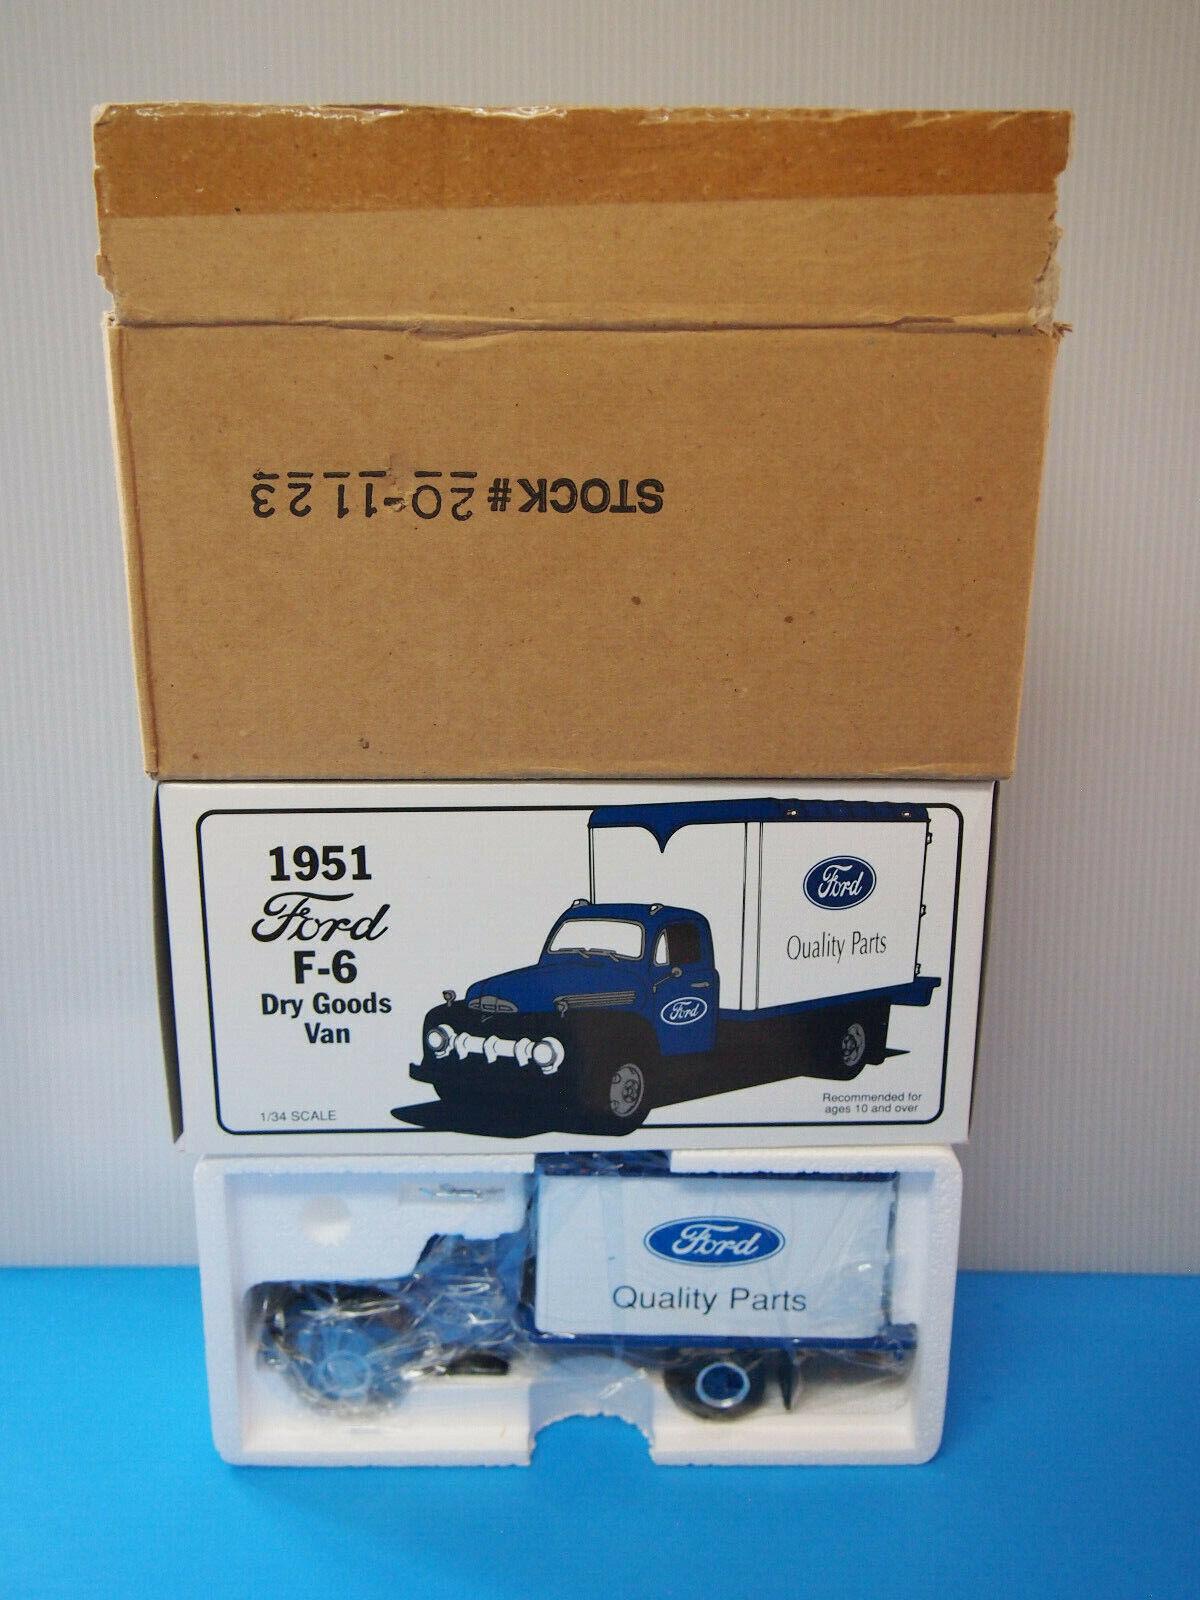 1951 Ford F6 Dry Goods van 1 34 - Hershey's Jarabe-First Gear   19-1002